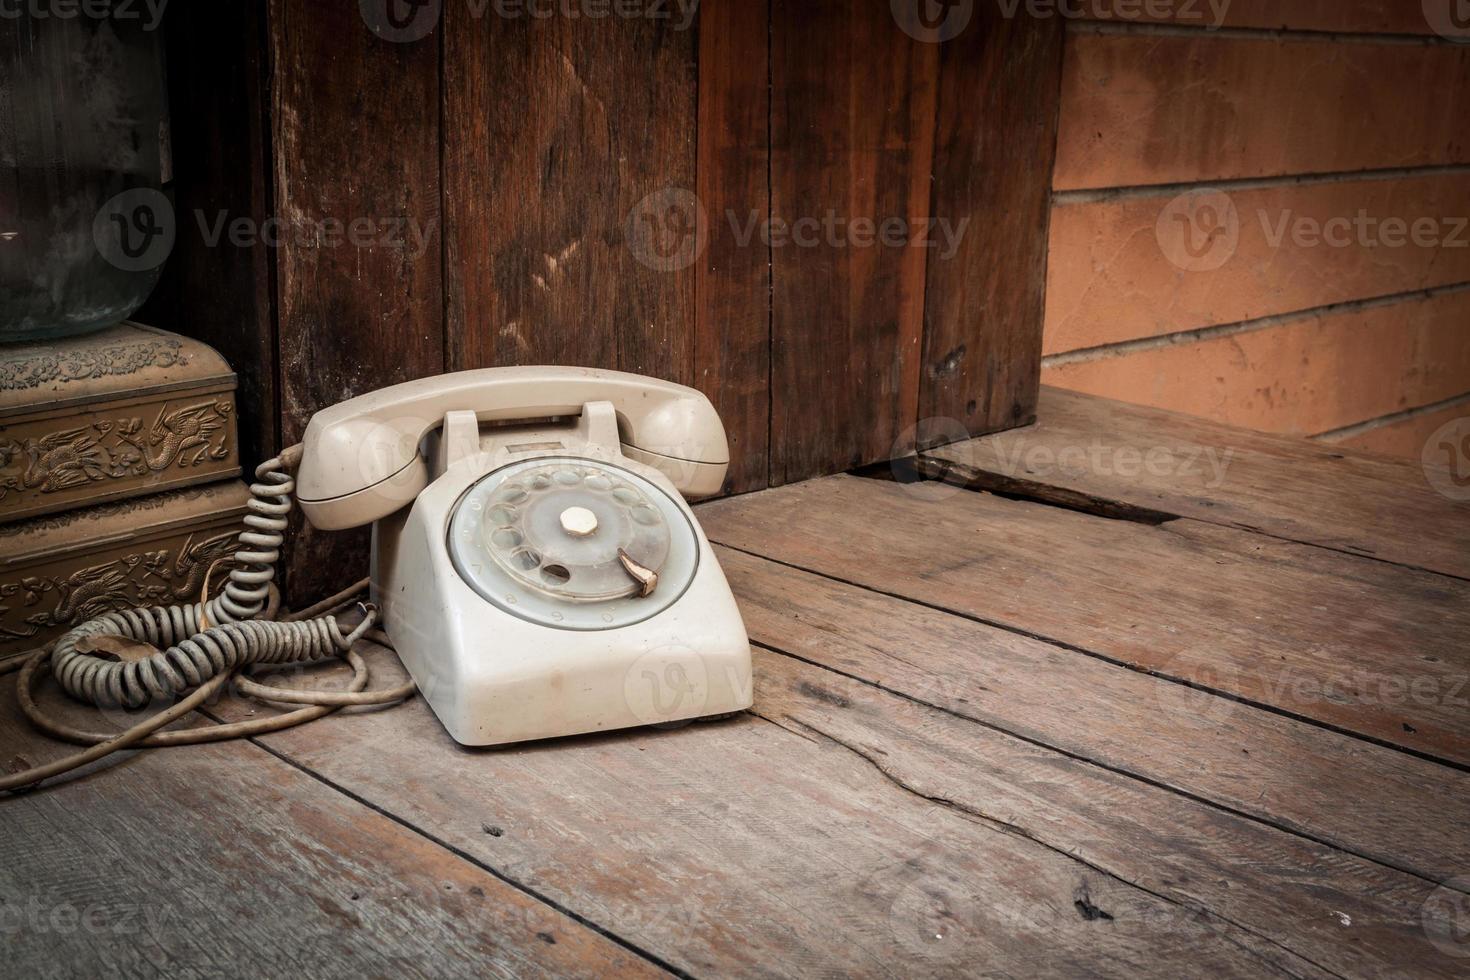 vintage telefon på trä bakgrund foto